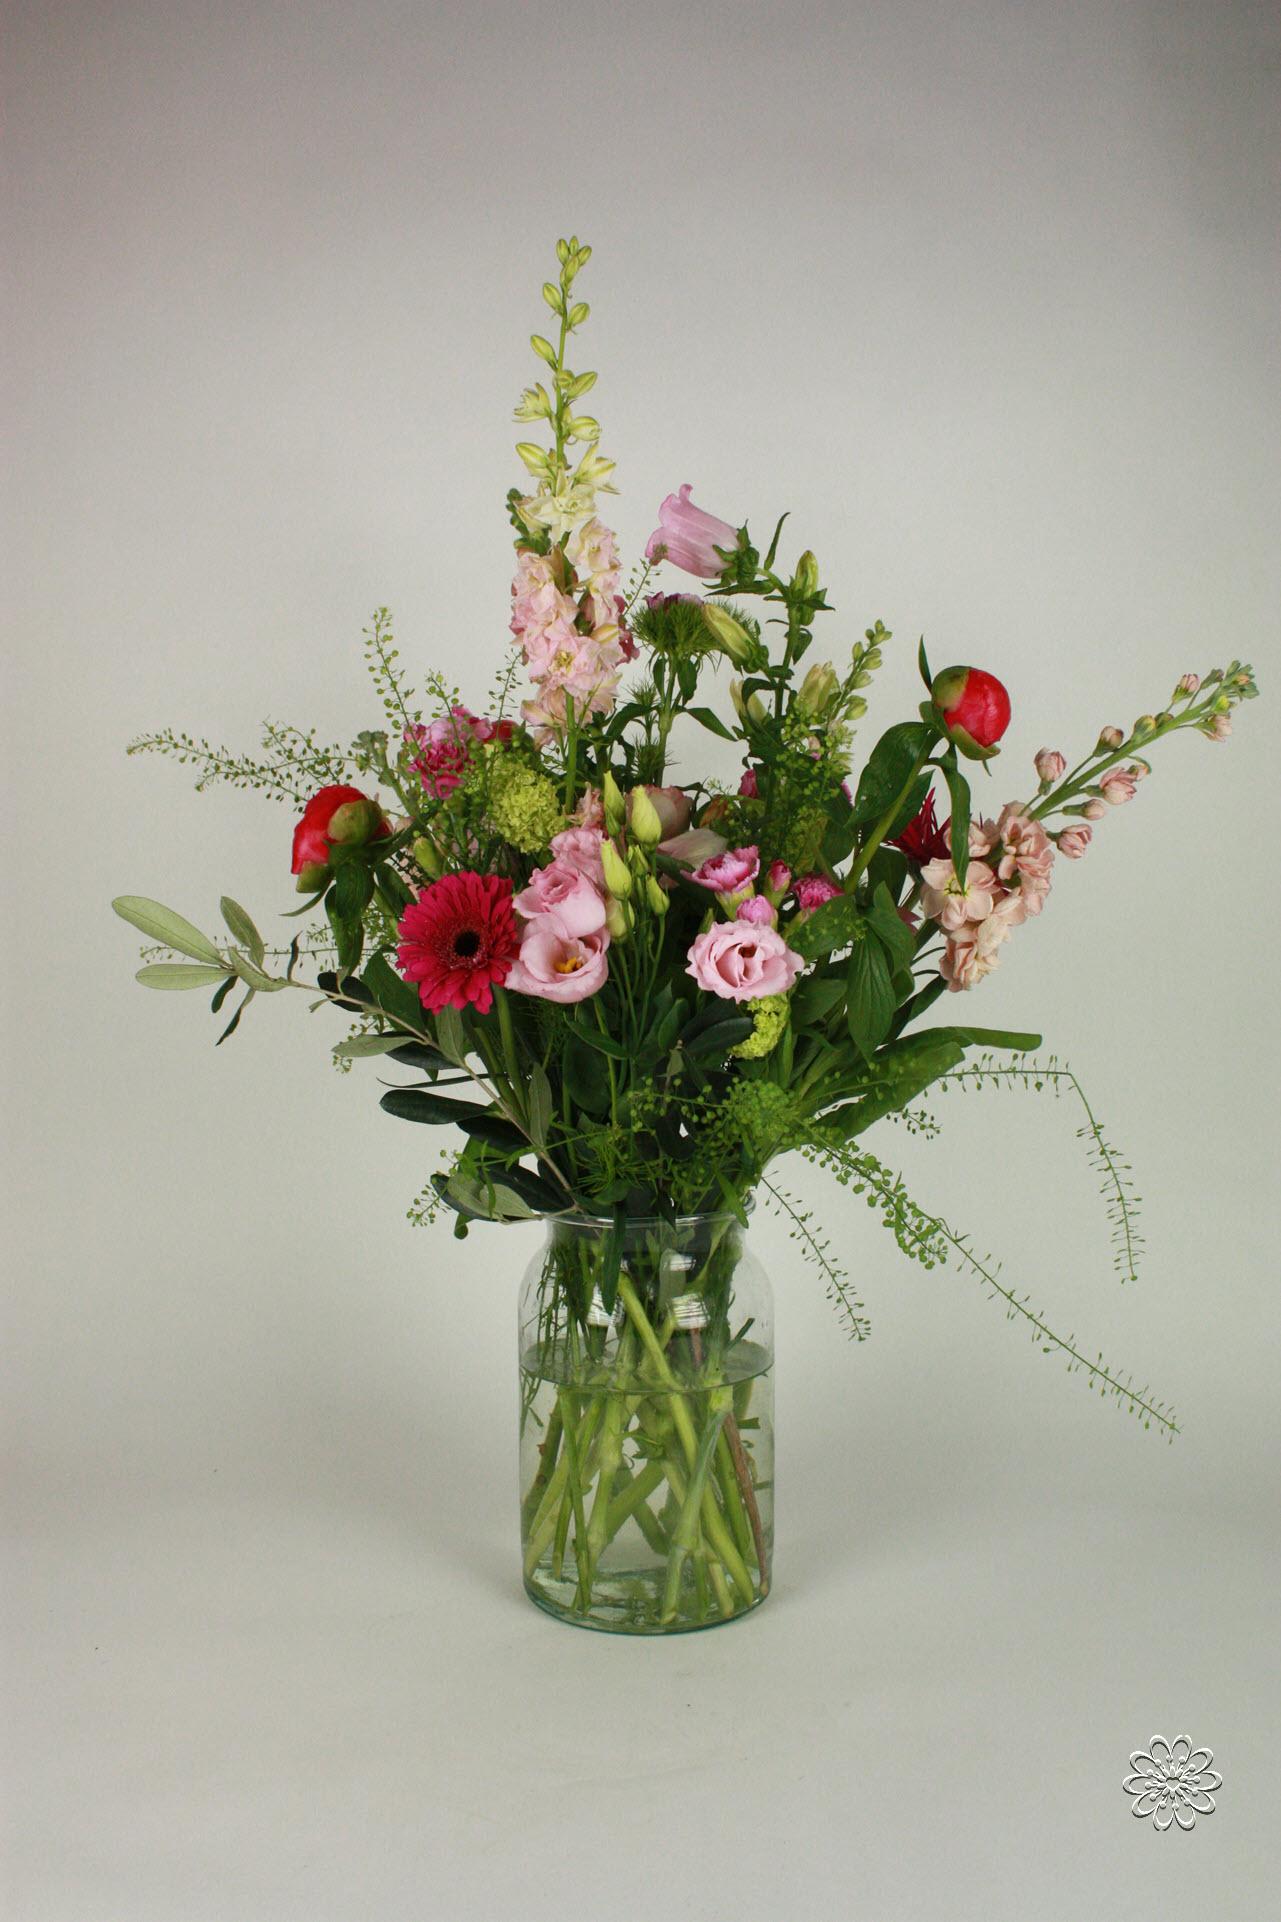 Boeket Bloemsierkunst Groeneveld roze